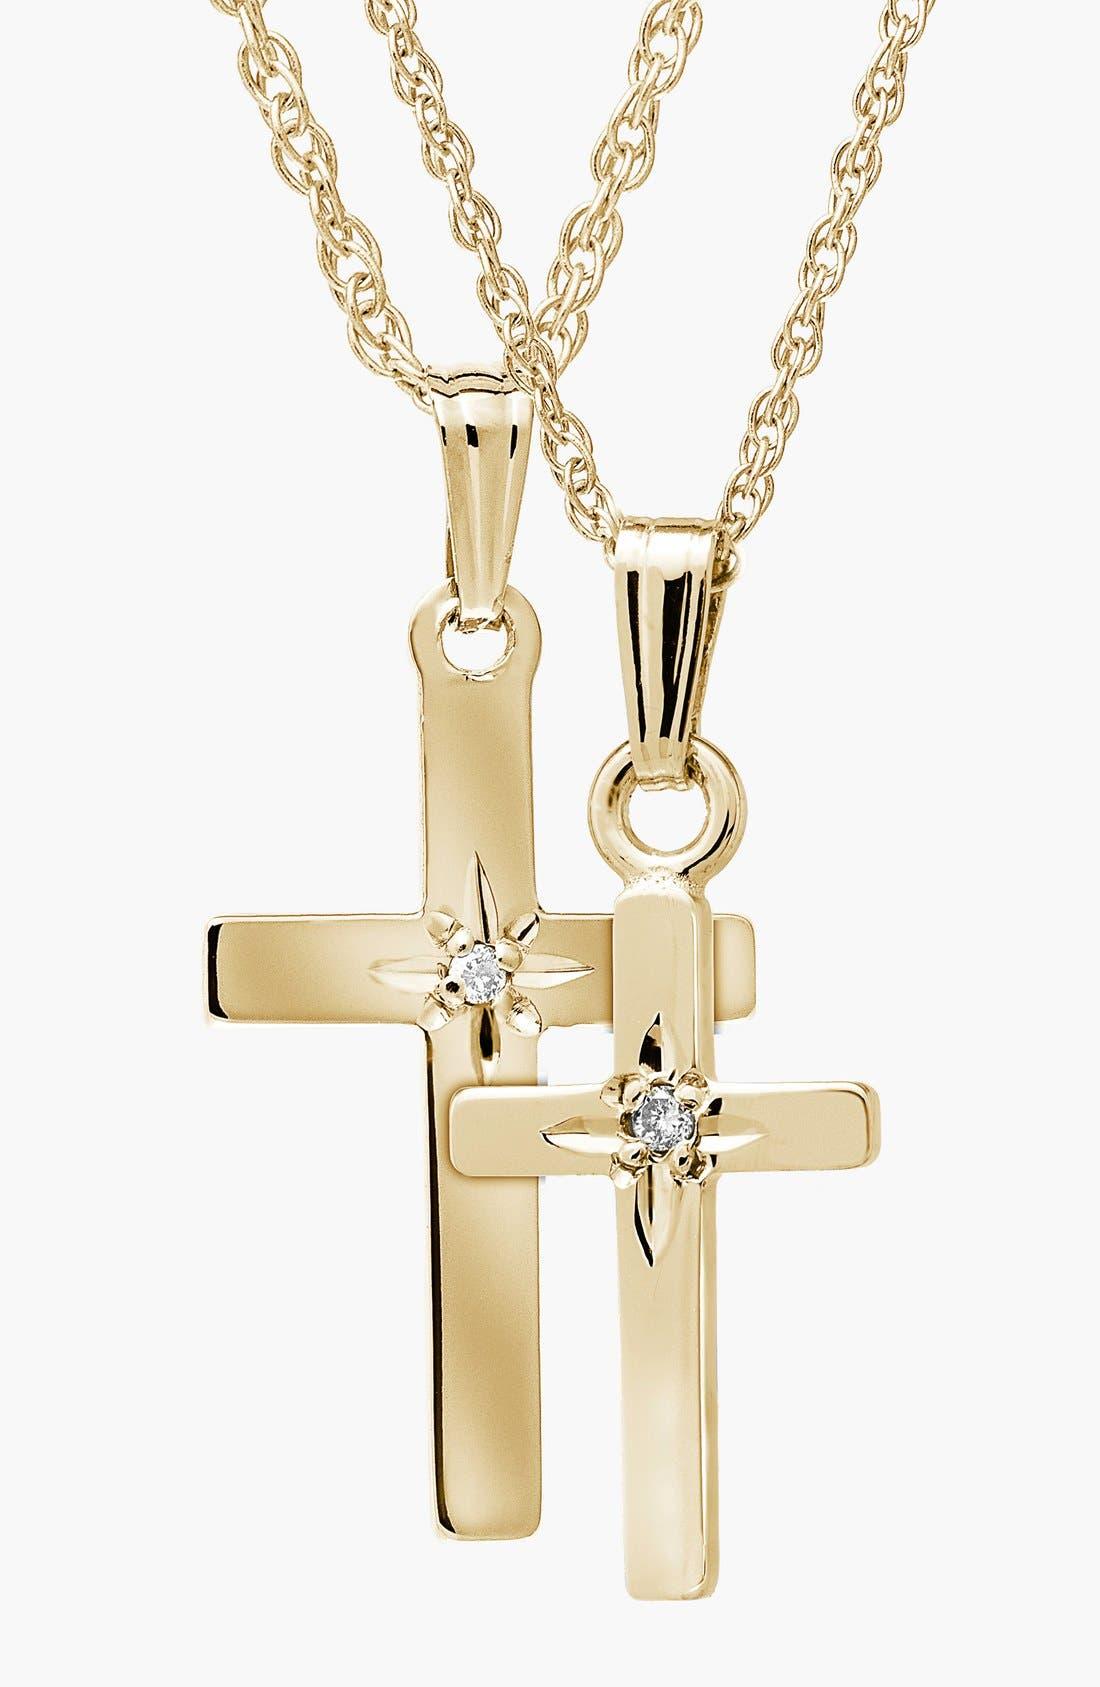 14k Gold & Diamond Cross Mother & Daughter Necklace Set,                             Main thumbnail 1, color,                             710